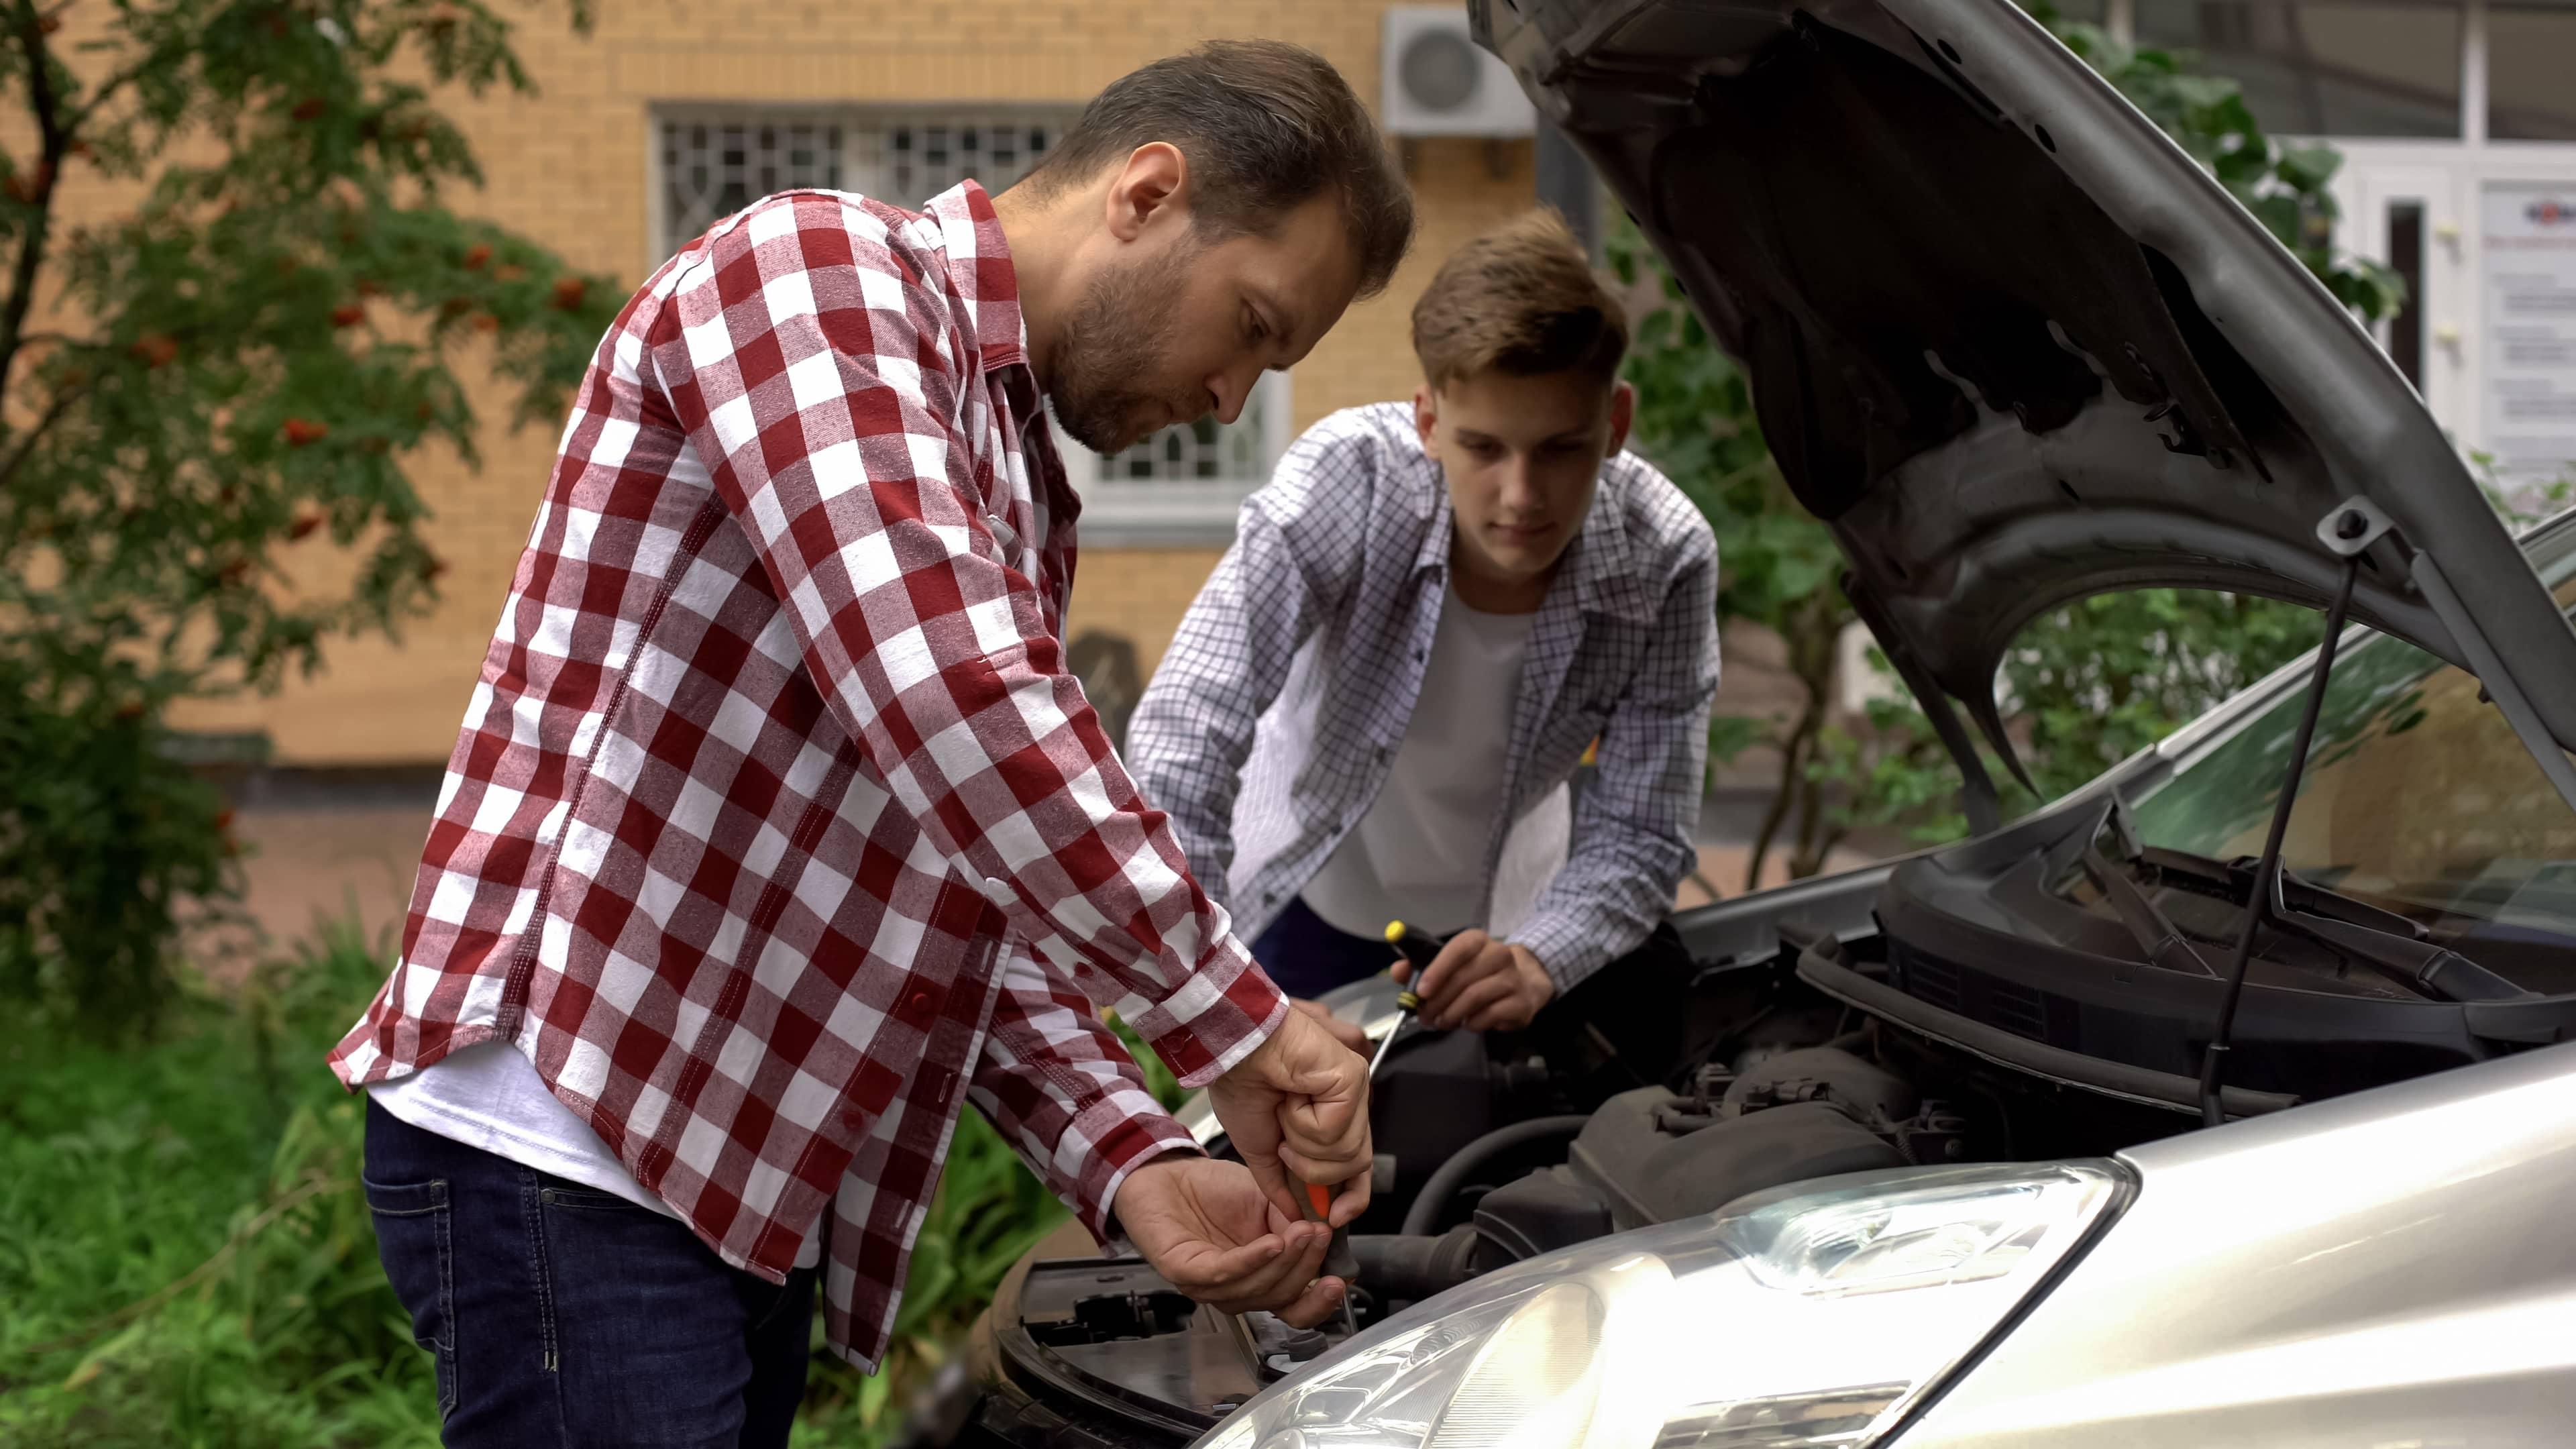 Father teaching his son critical thinking through mechanics